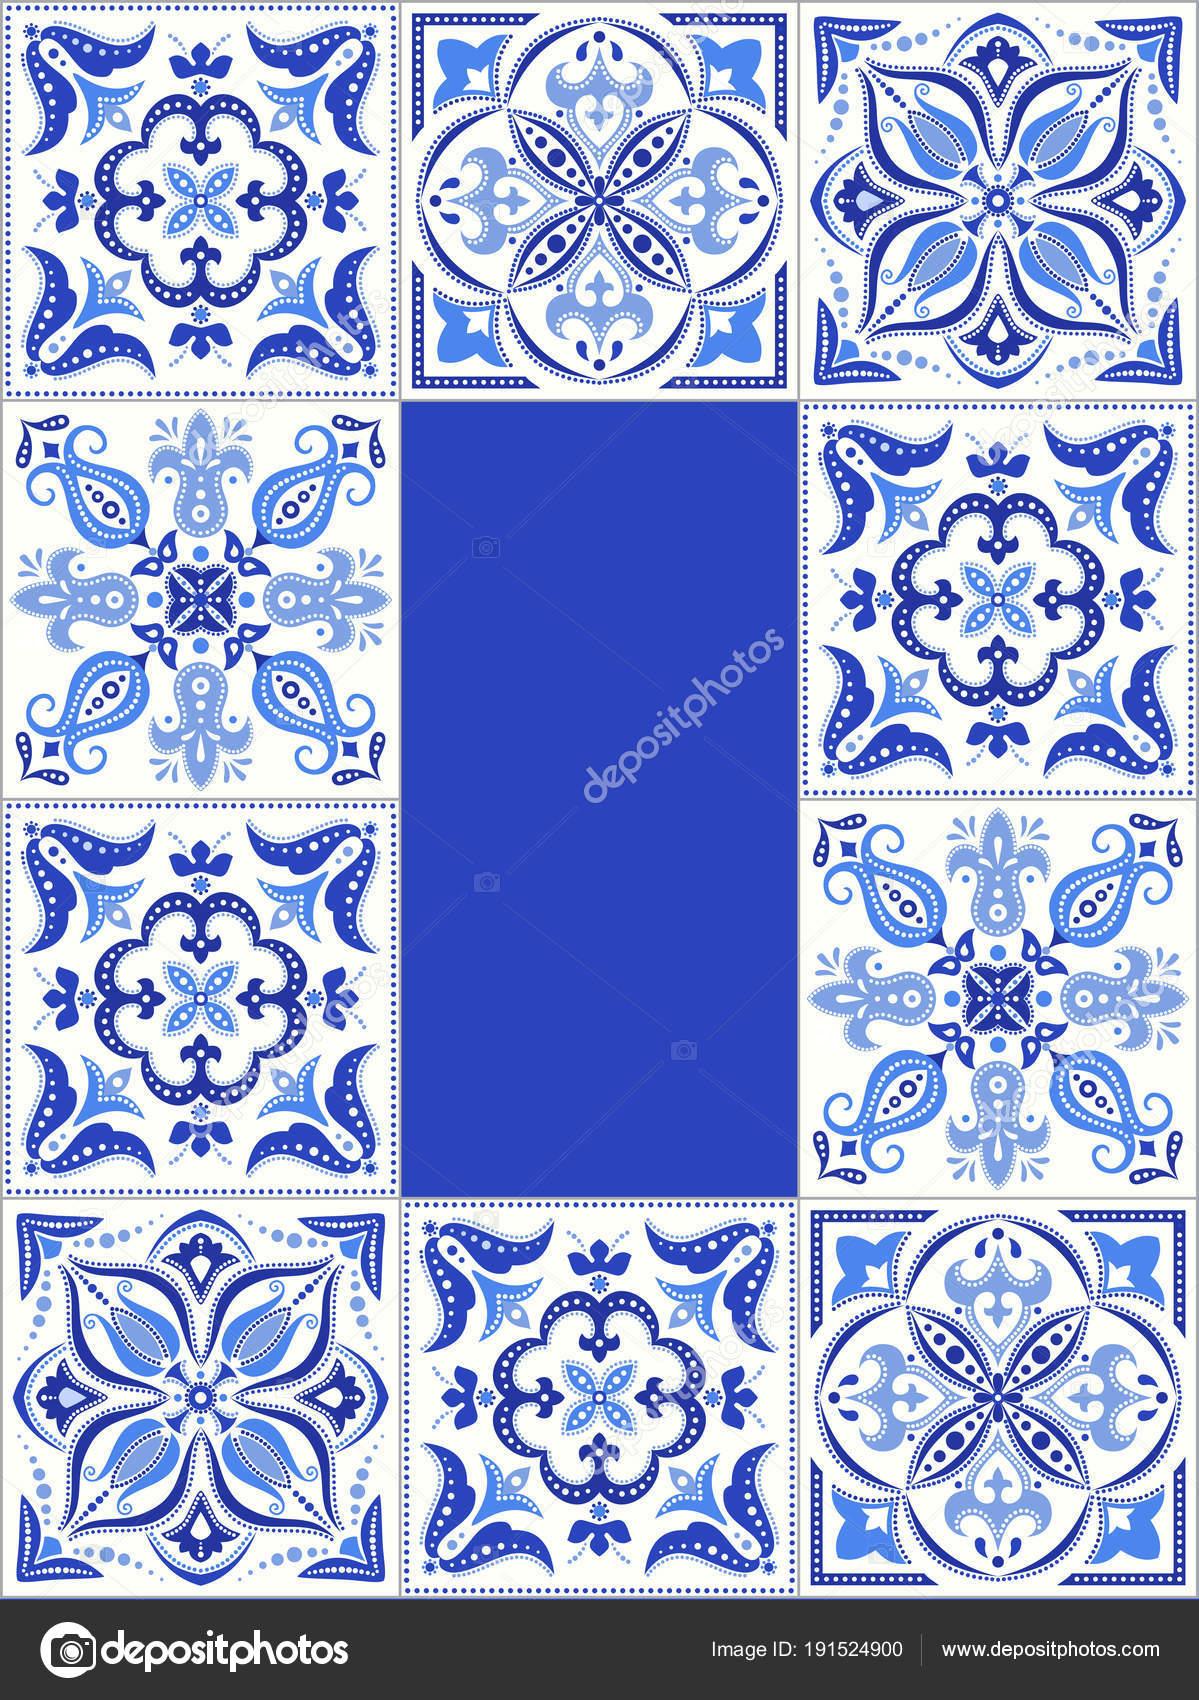 Blaue Fliesen Muster Rahmen — Stockvektor © Irmairma #191524900